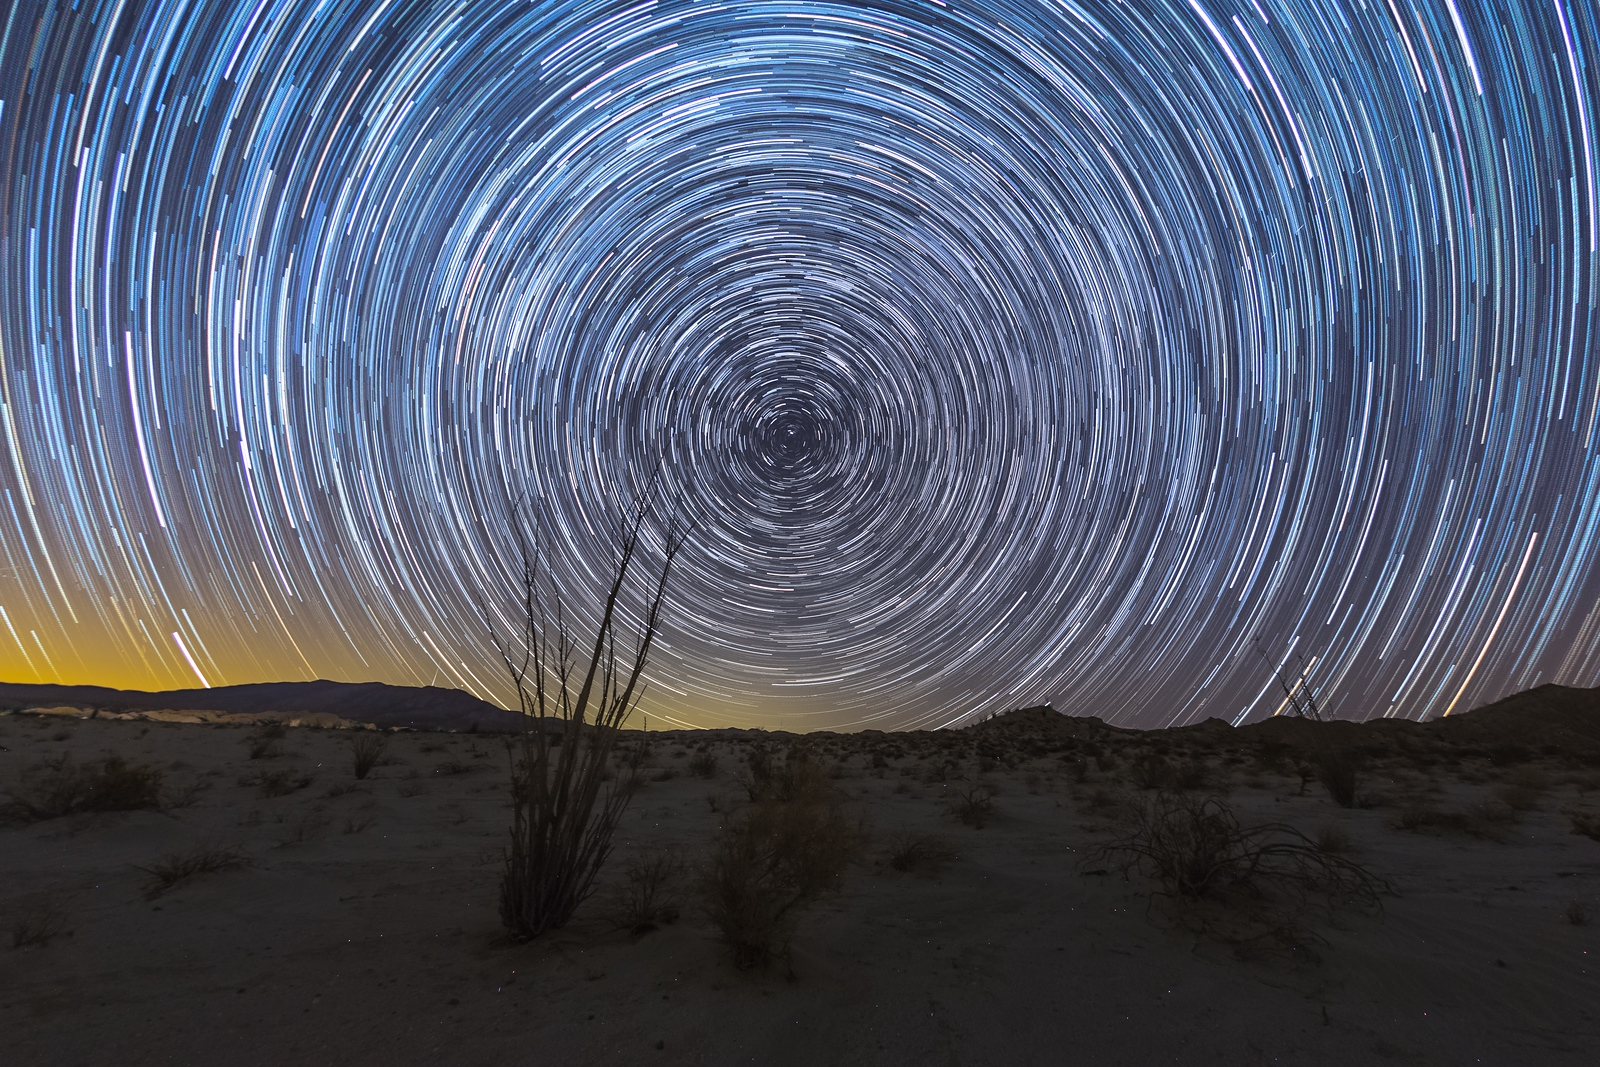 Some More Star Trails Above the Anza-Borrego Desert